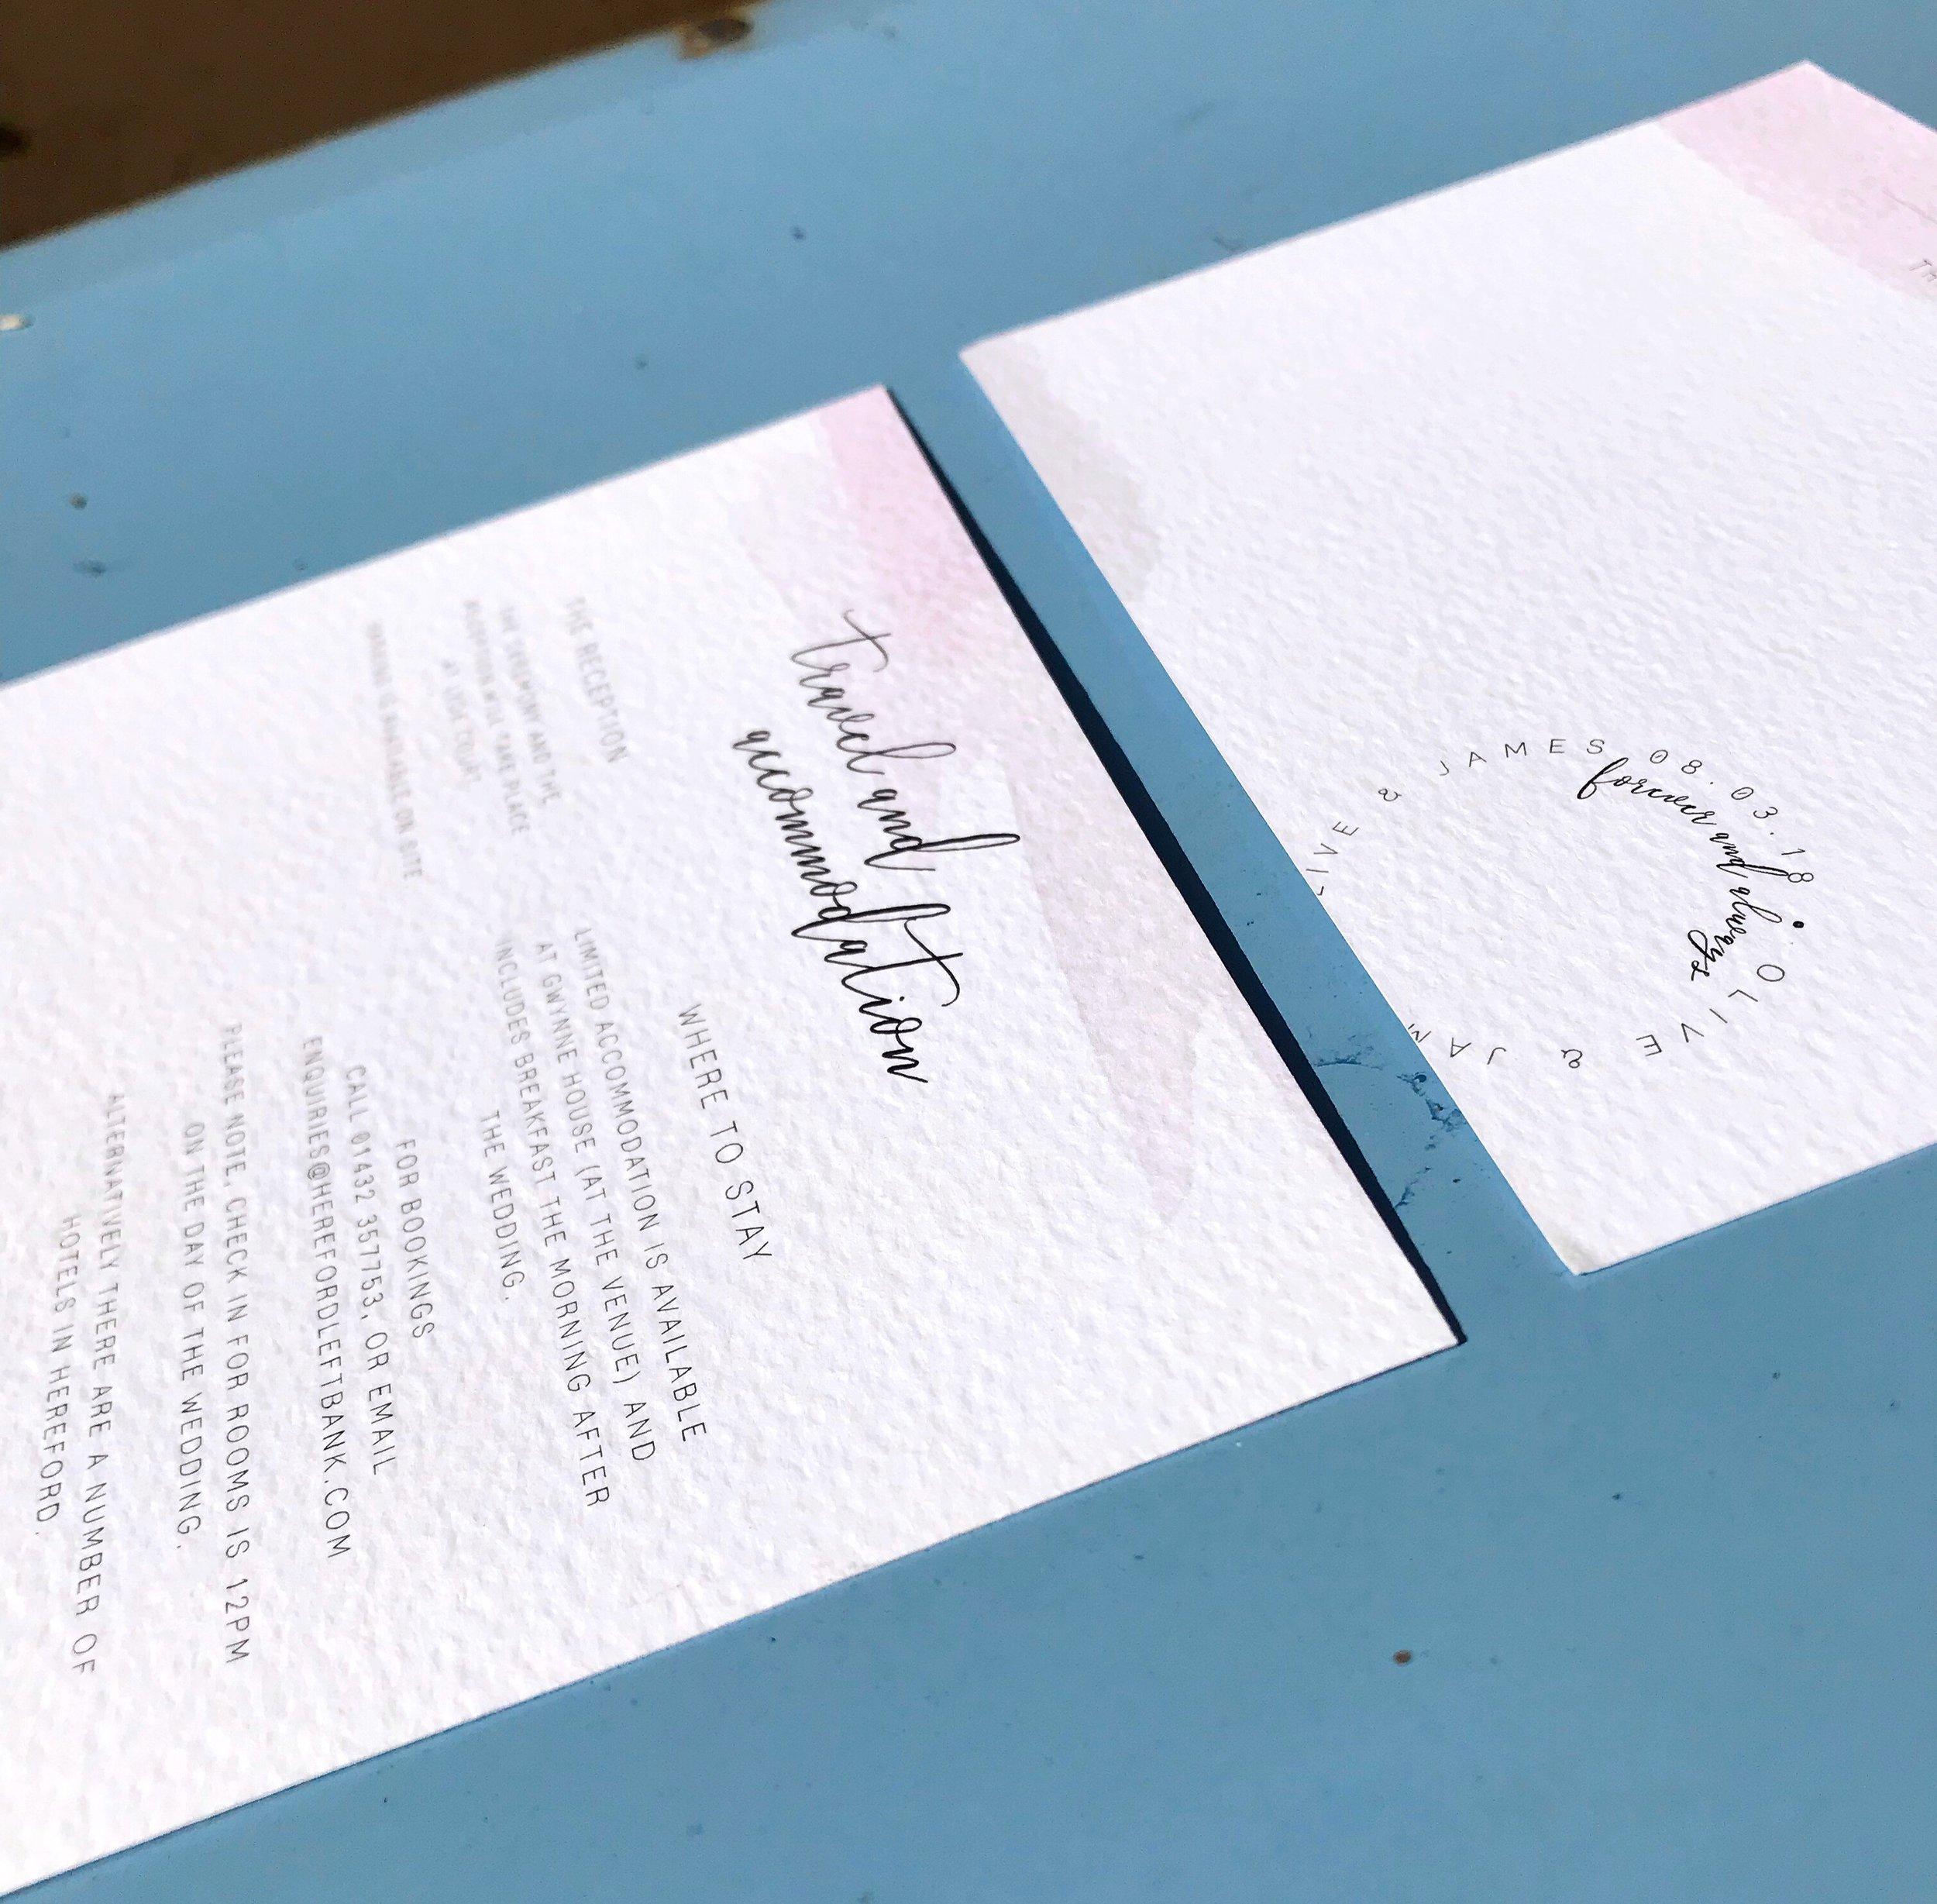 colour-splash-watercolour-wedding-invite-the-ink-closet-travel-info-closeup.jpg